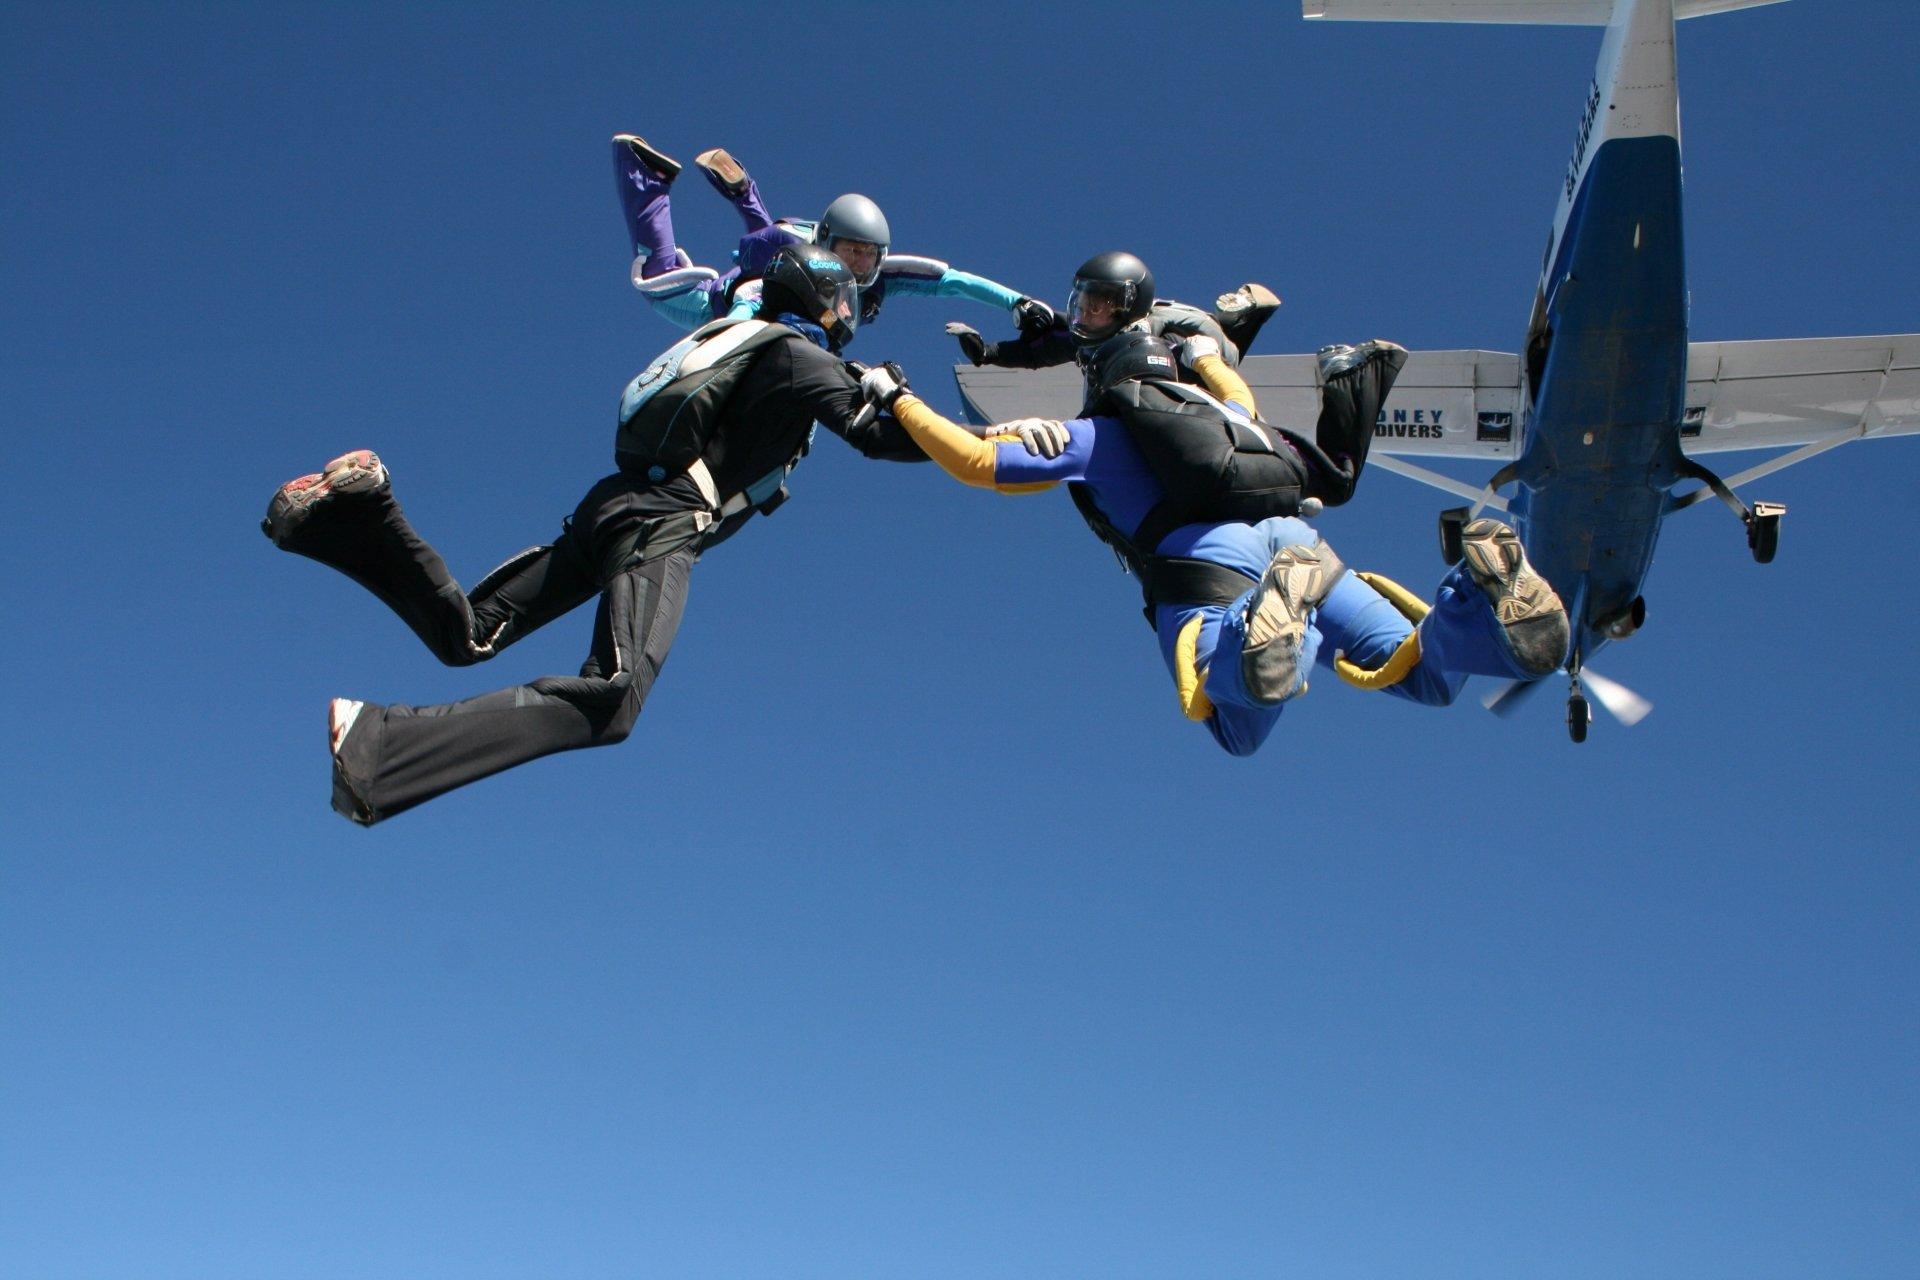 Sports - Skydiving  Wallpaper